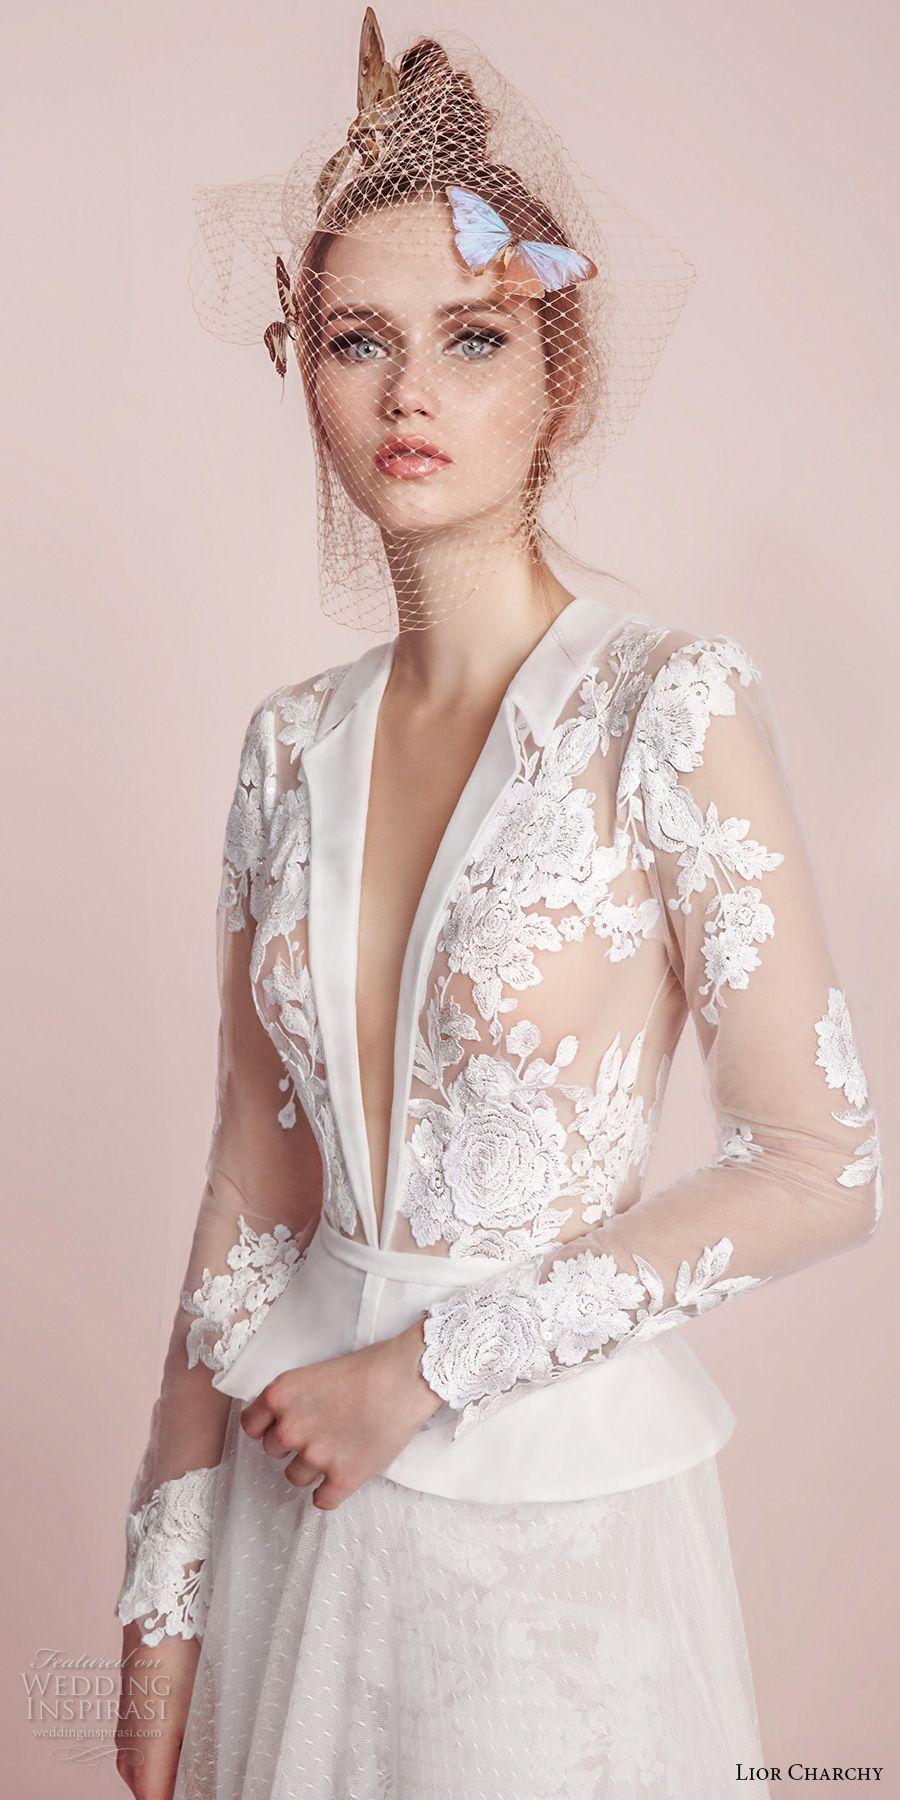 Lior charchy spring bridal long sleeves deep plunging v neck